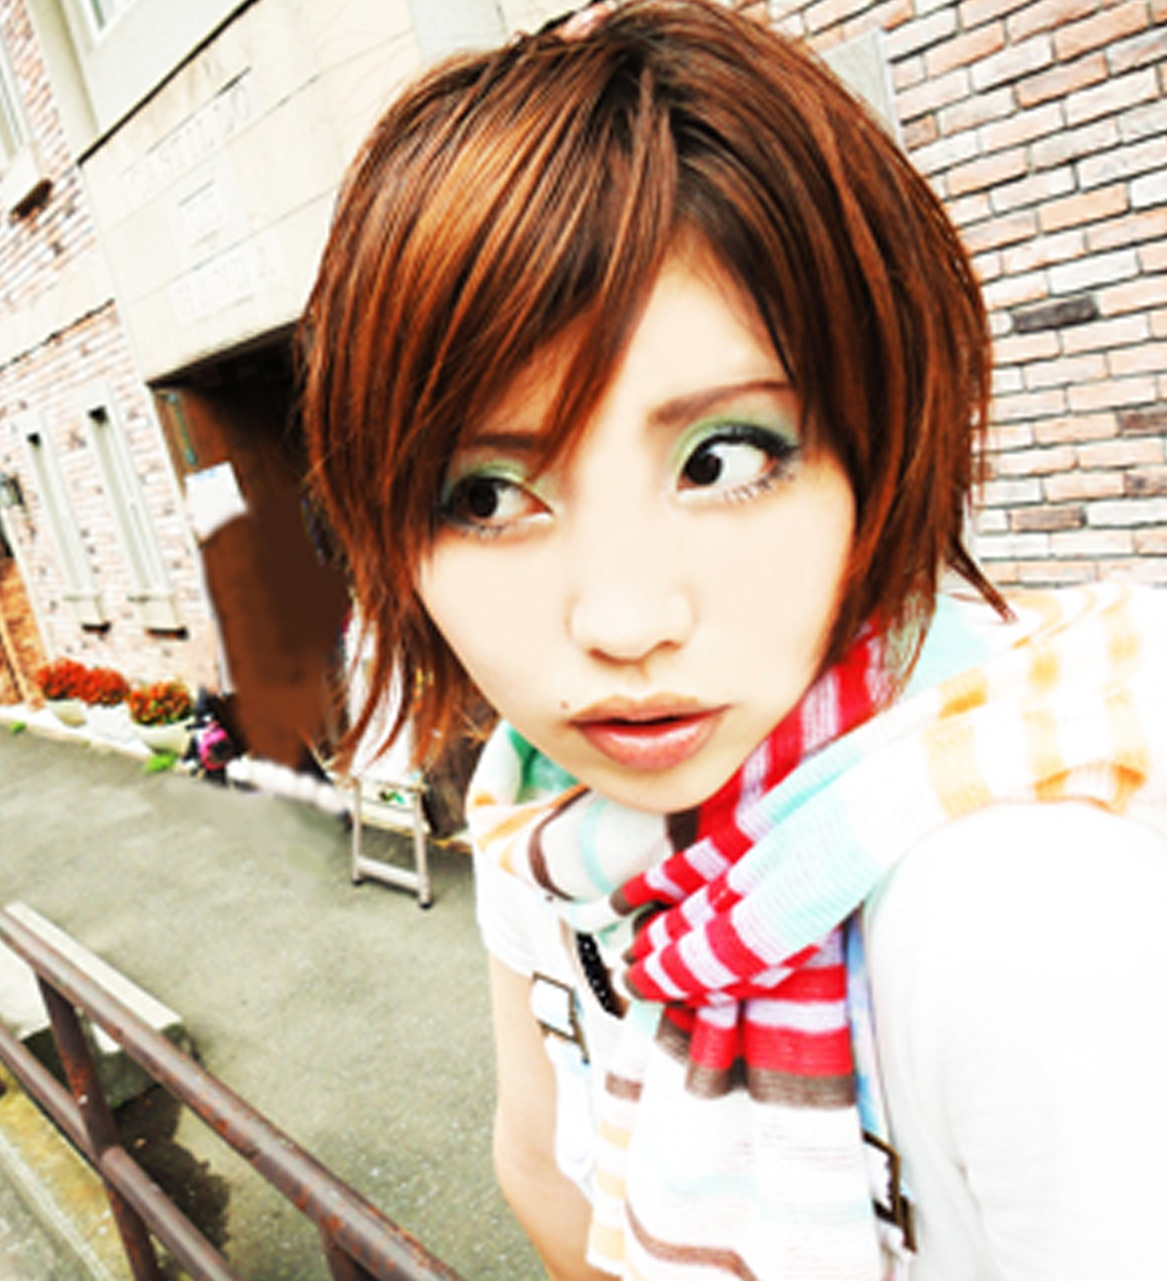 http://onkoma.jp/event/yumico-s.jpg